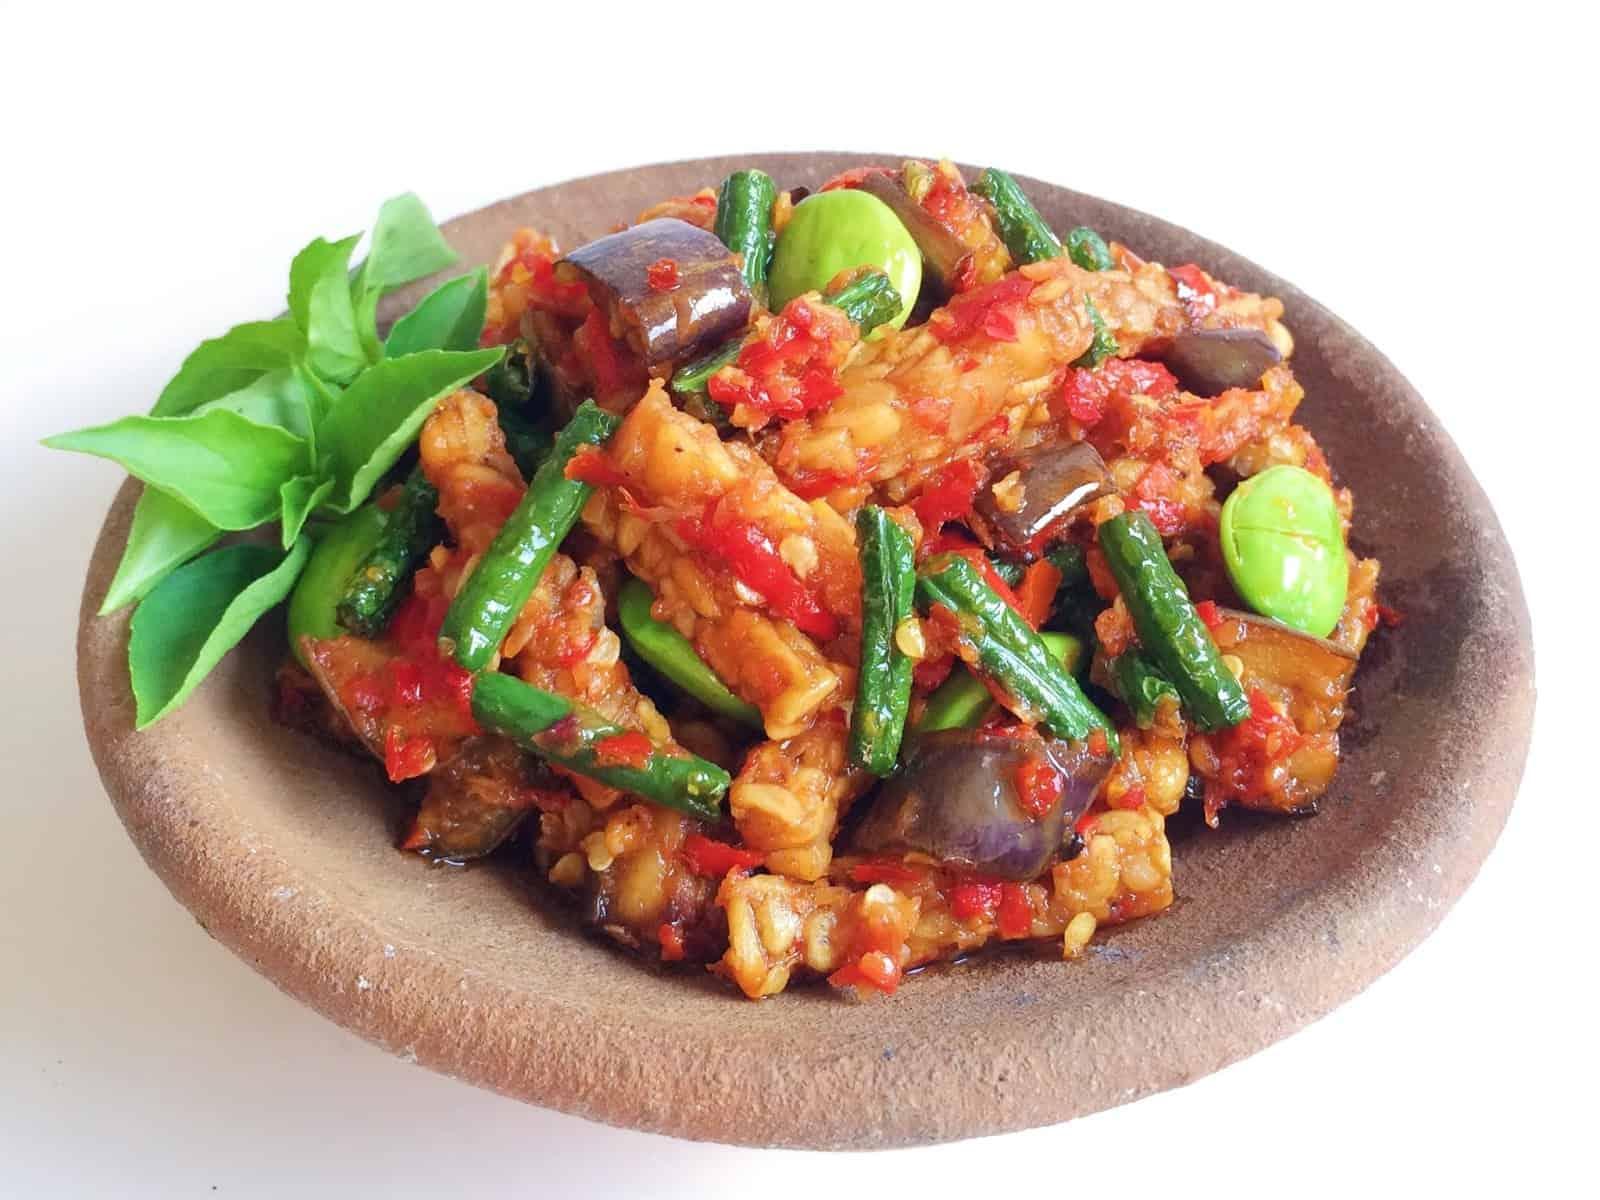 gambar makanan khas kalimantan timur Sambal Raja